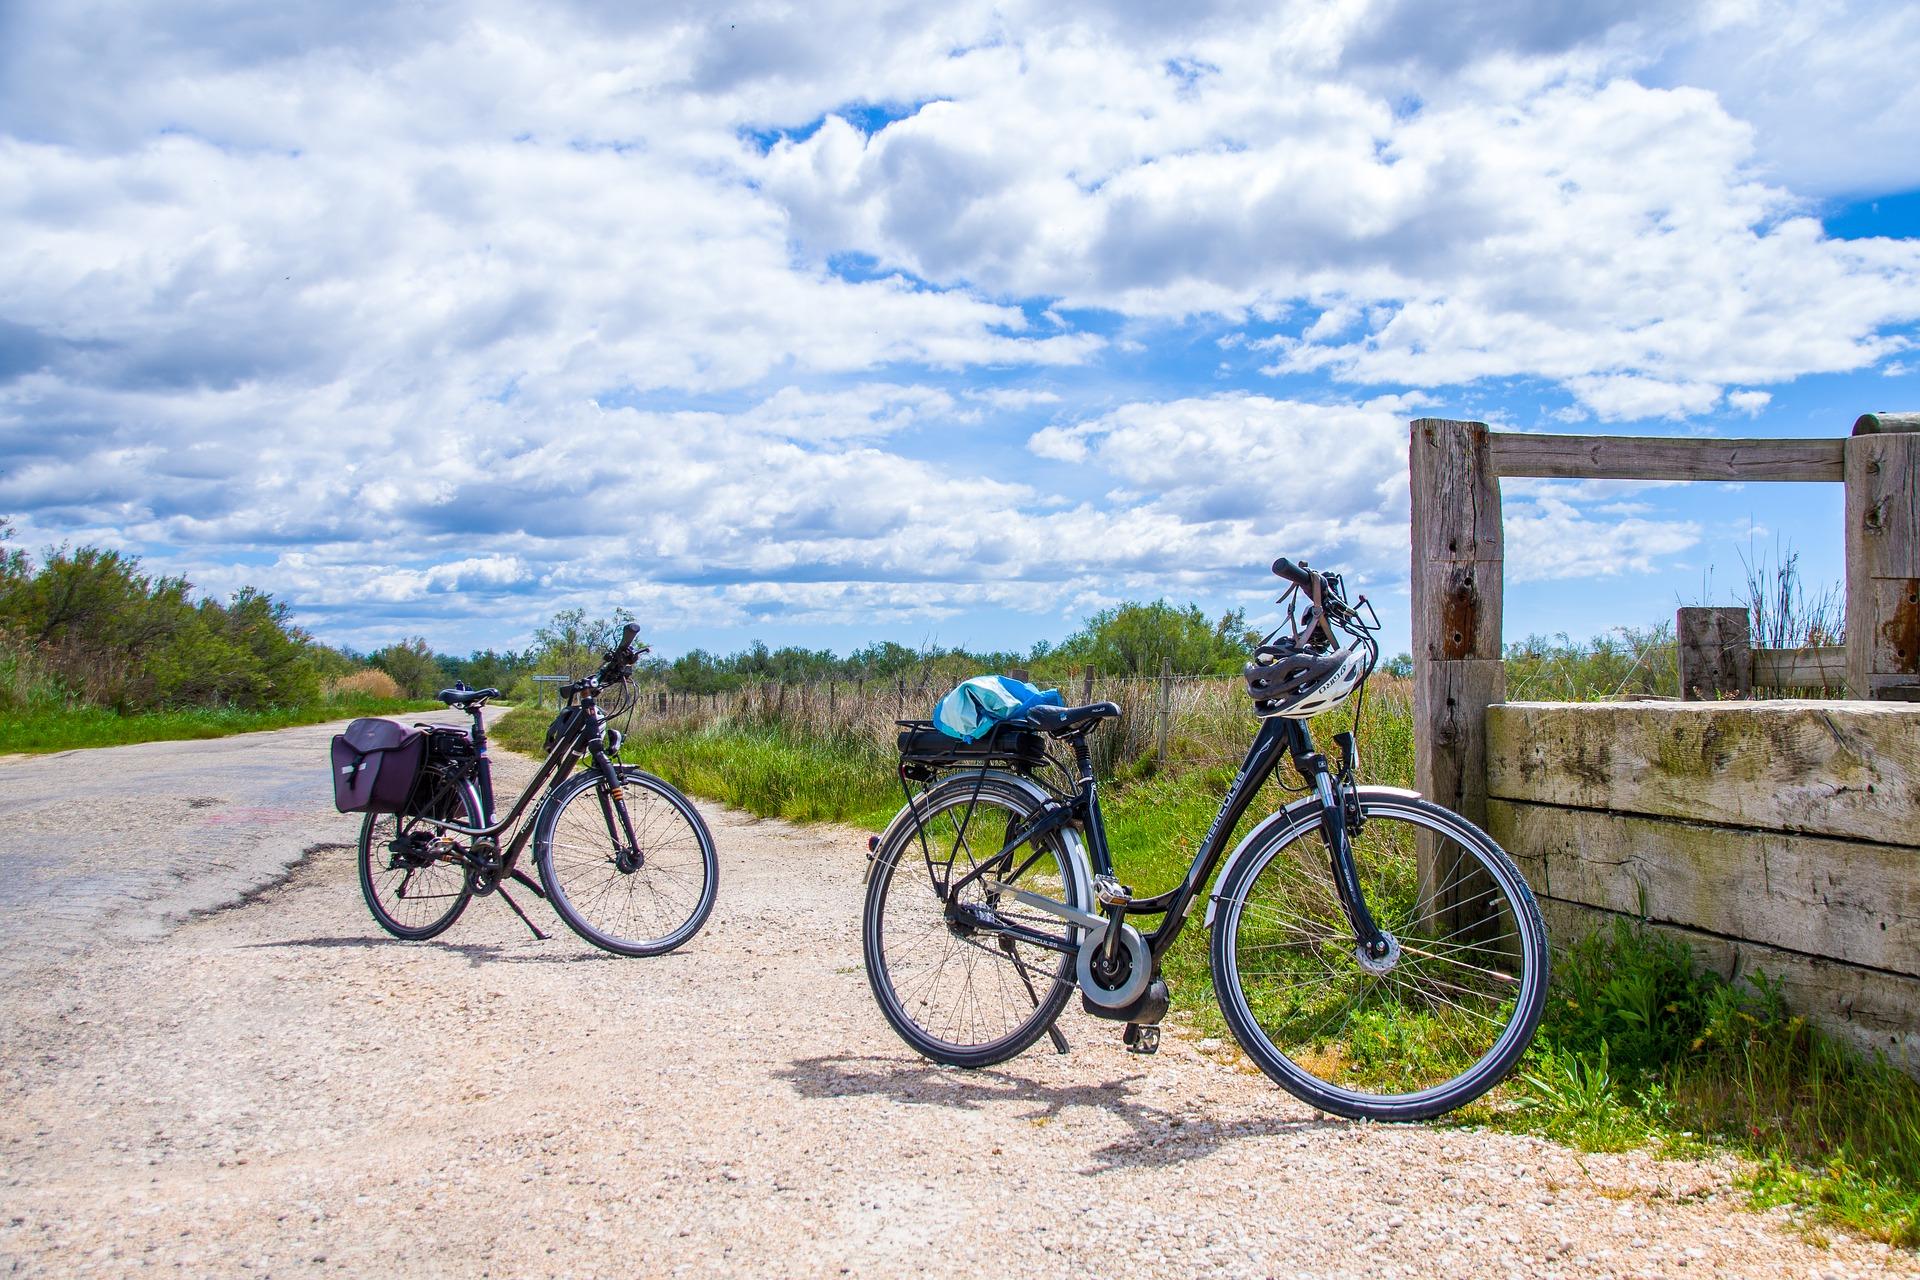 Bicycle travelers